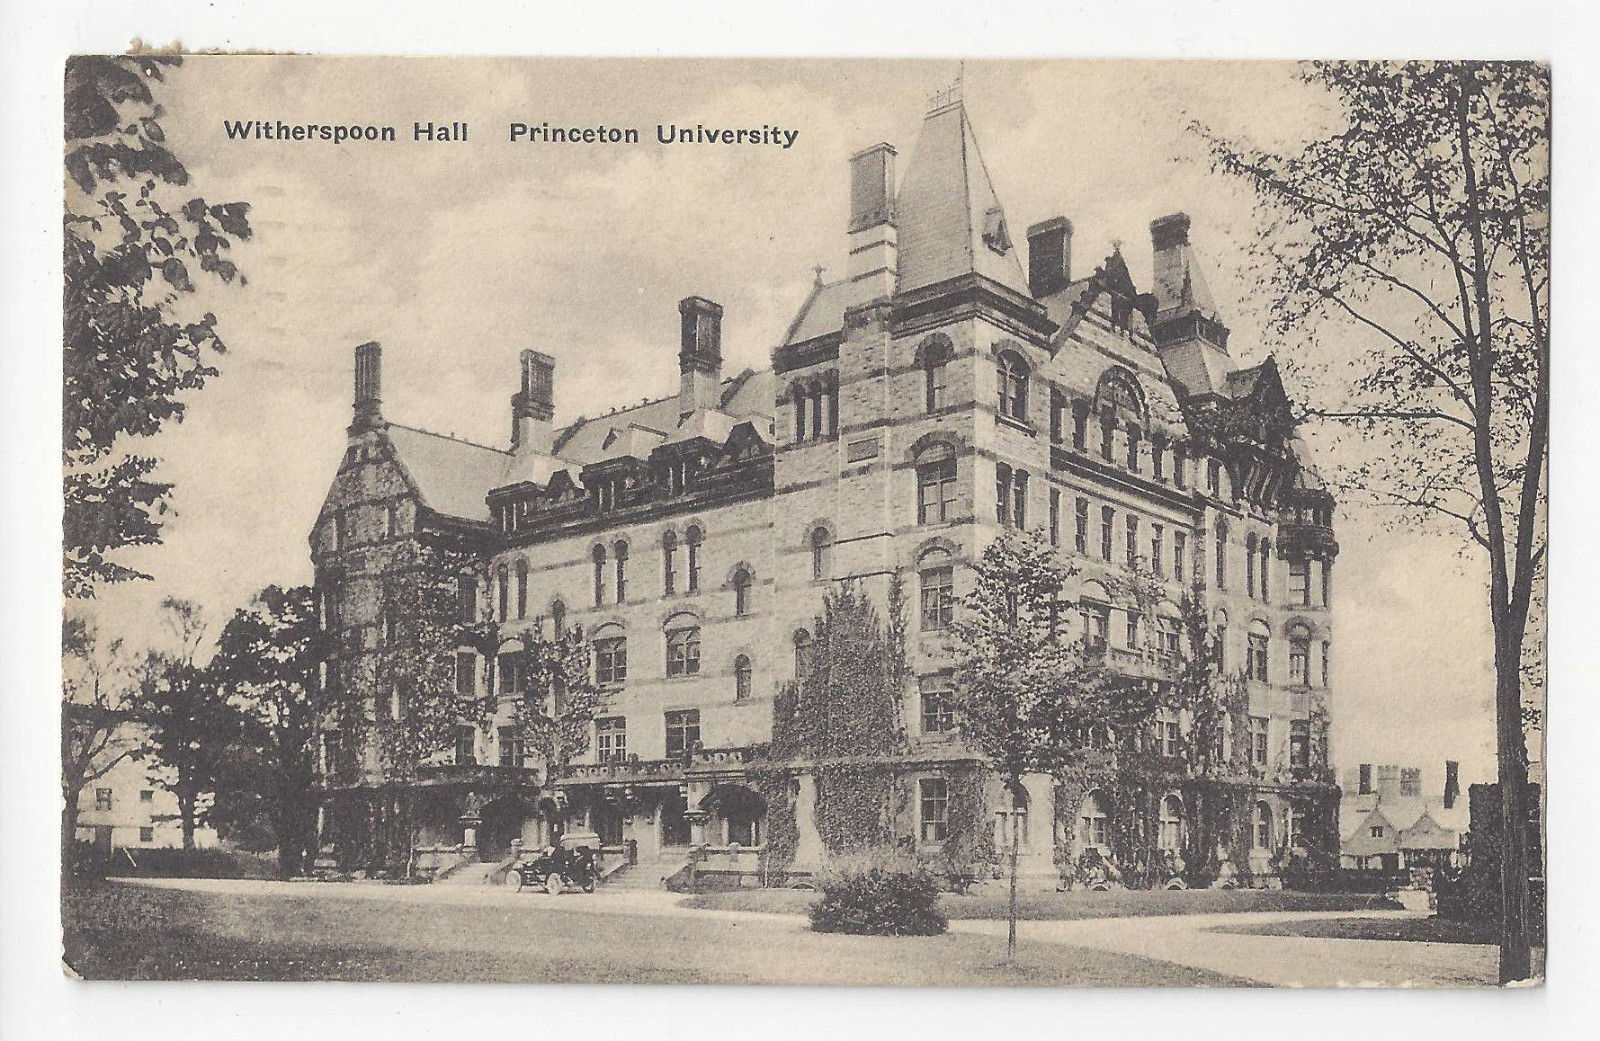 NJ Princeton University Witherspoon Hall Vtg Albertype Postcard 1942